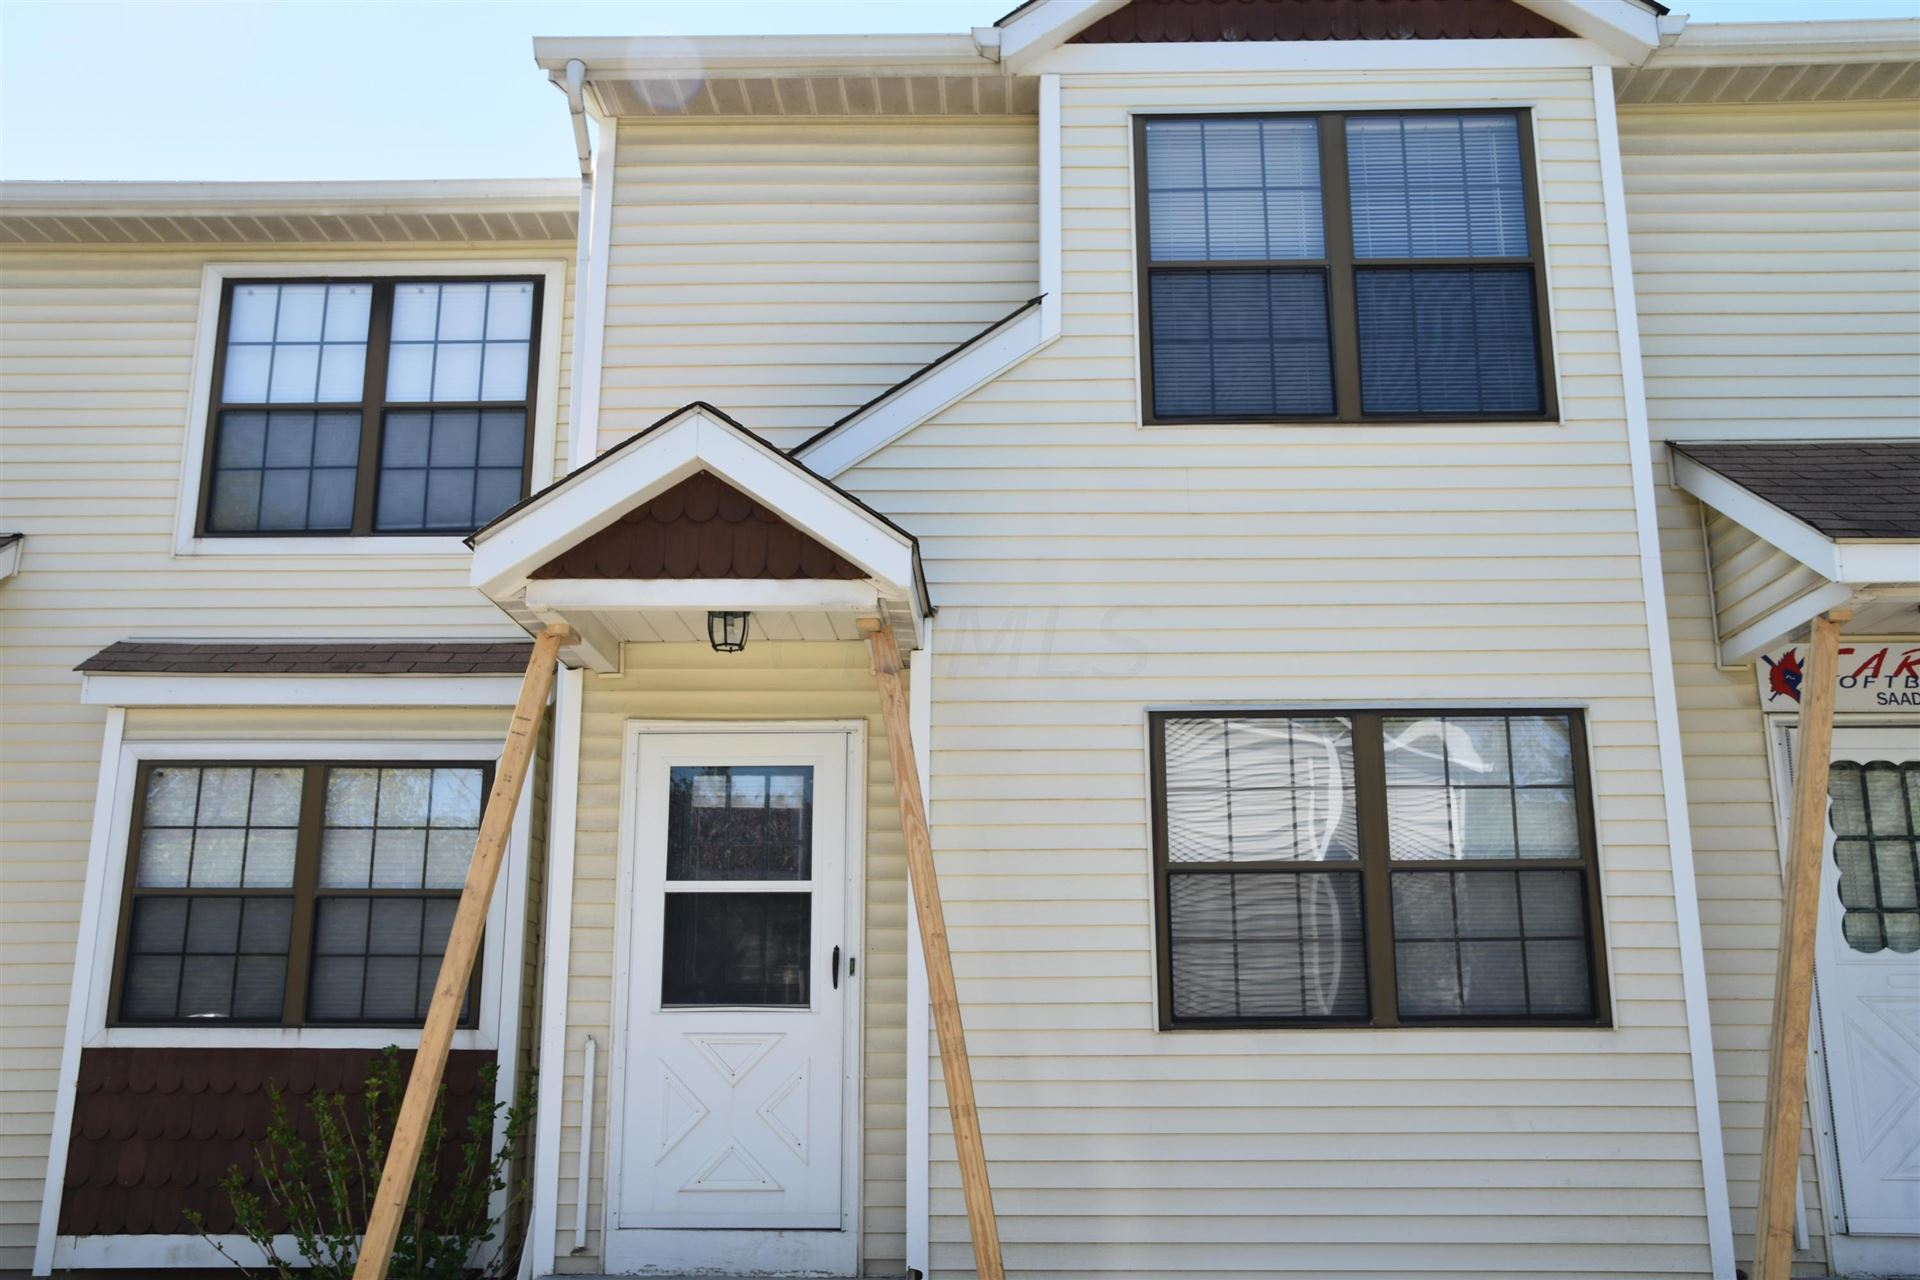 Photo of 873 Soramill Lane #4B, Worthington, OH 43085 (MLS # 221013973)